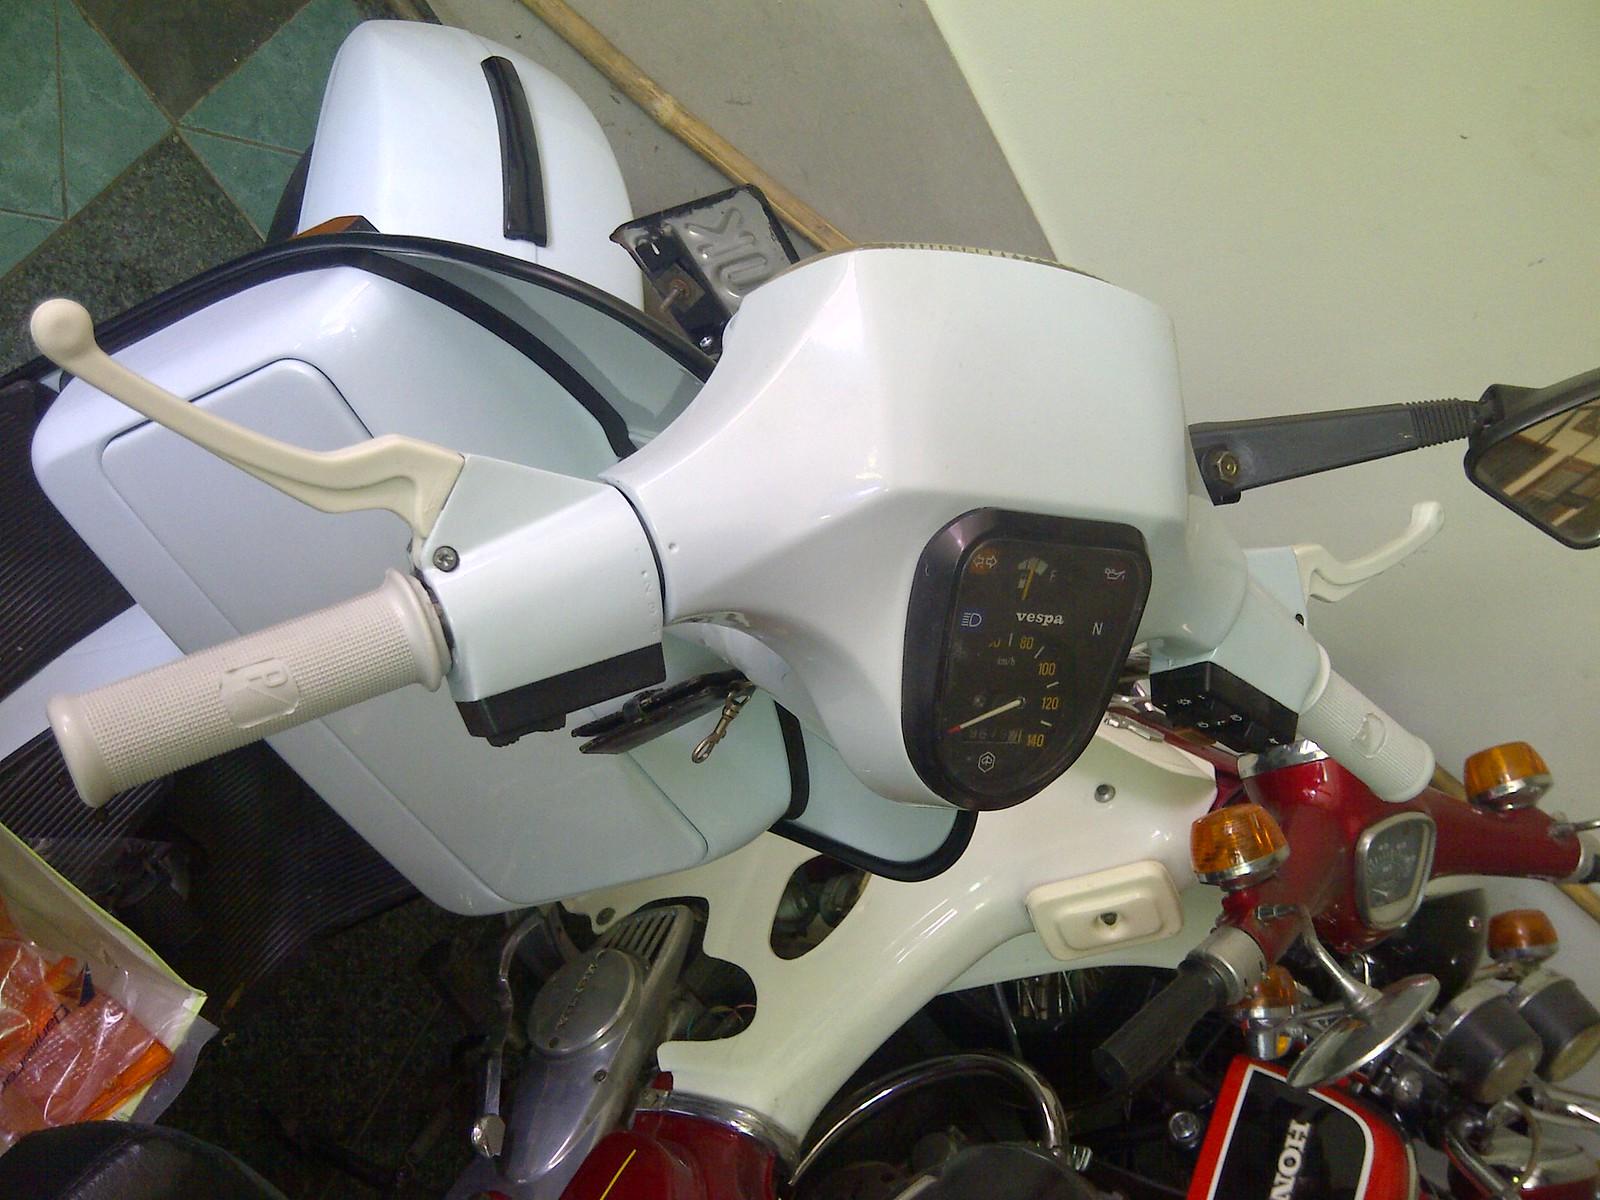 Modern Vespa My First Project Px 150 E 1989 Wiring Diagram Px150e White Ariete